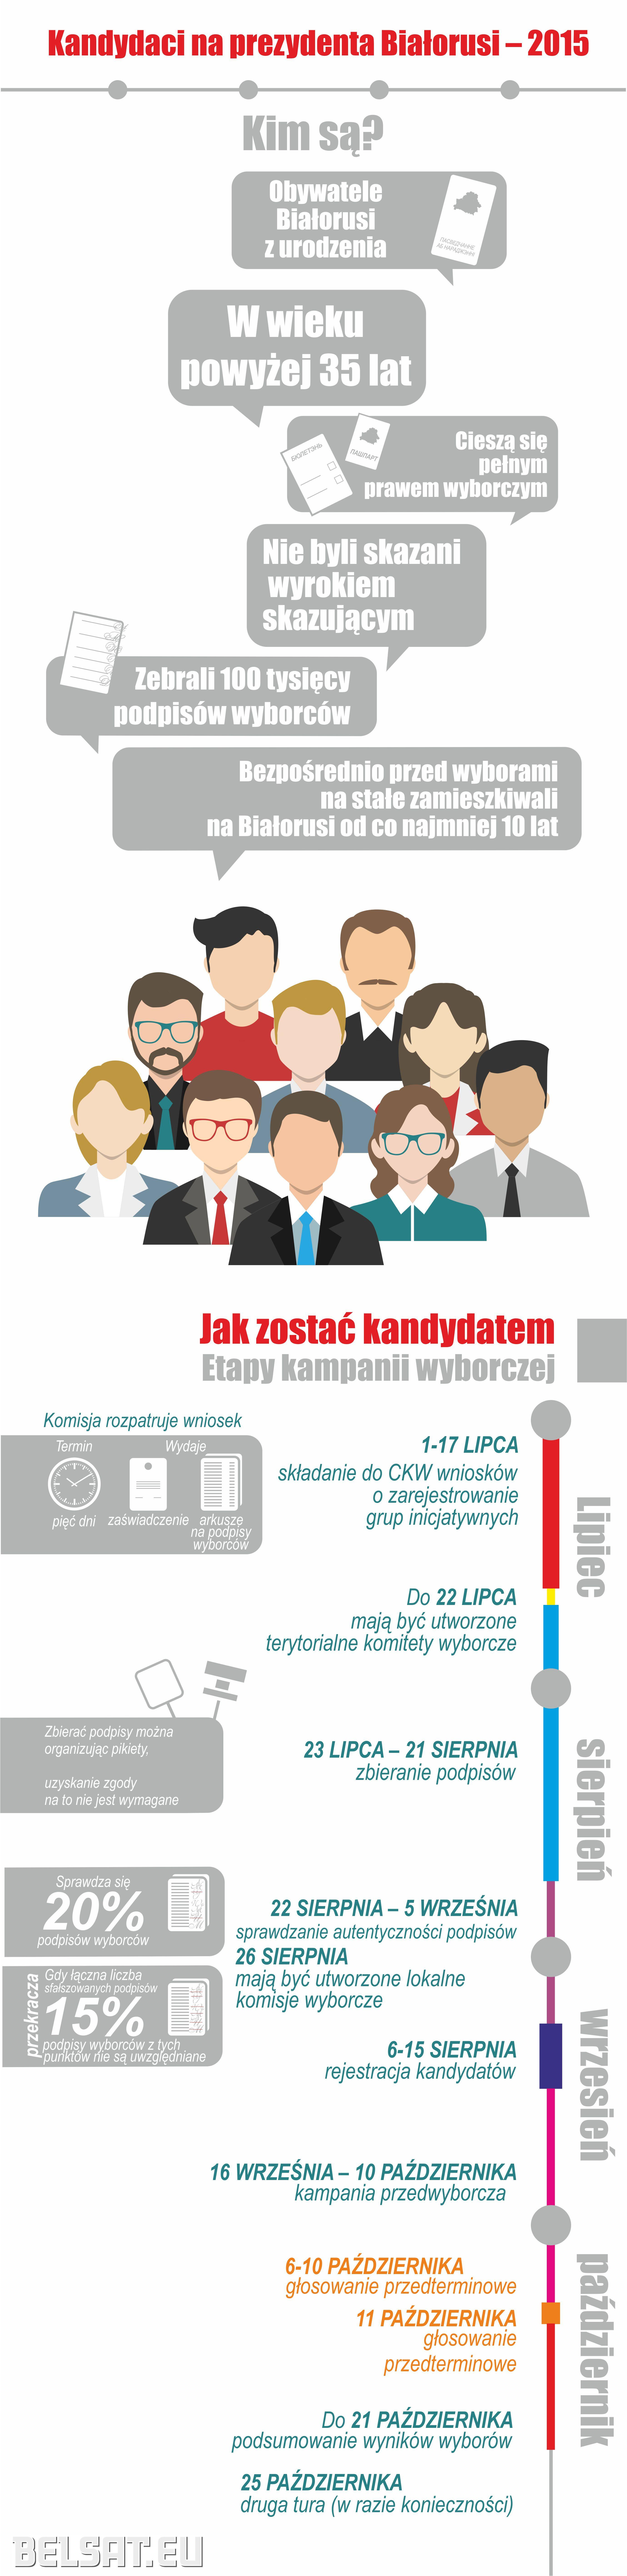 Kandydaci na prezydenta Białorusi – 2015 белсат